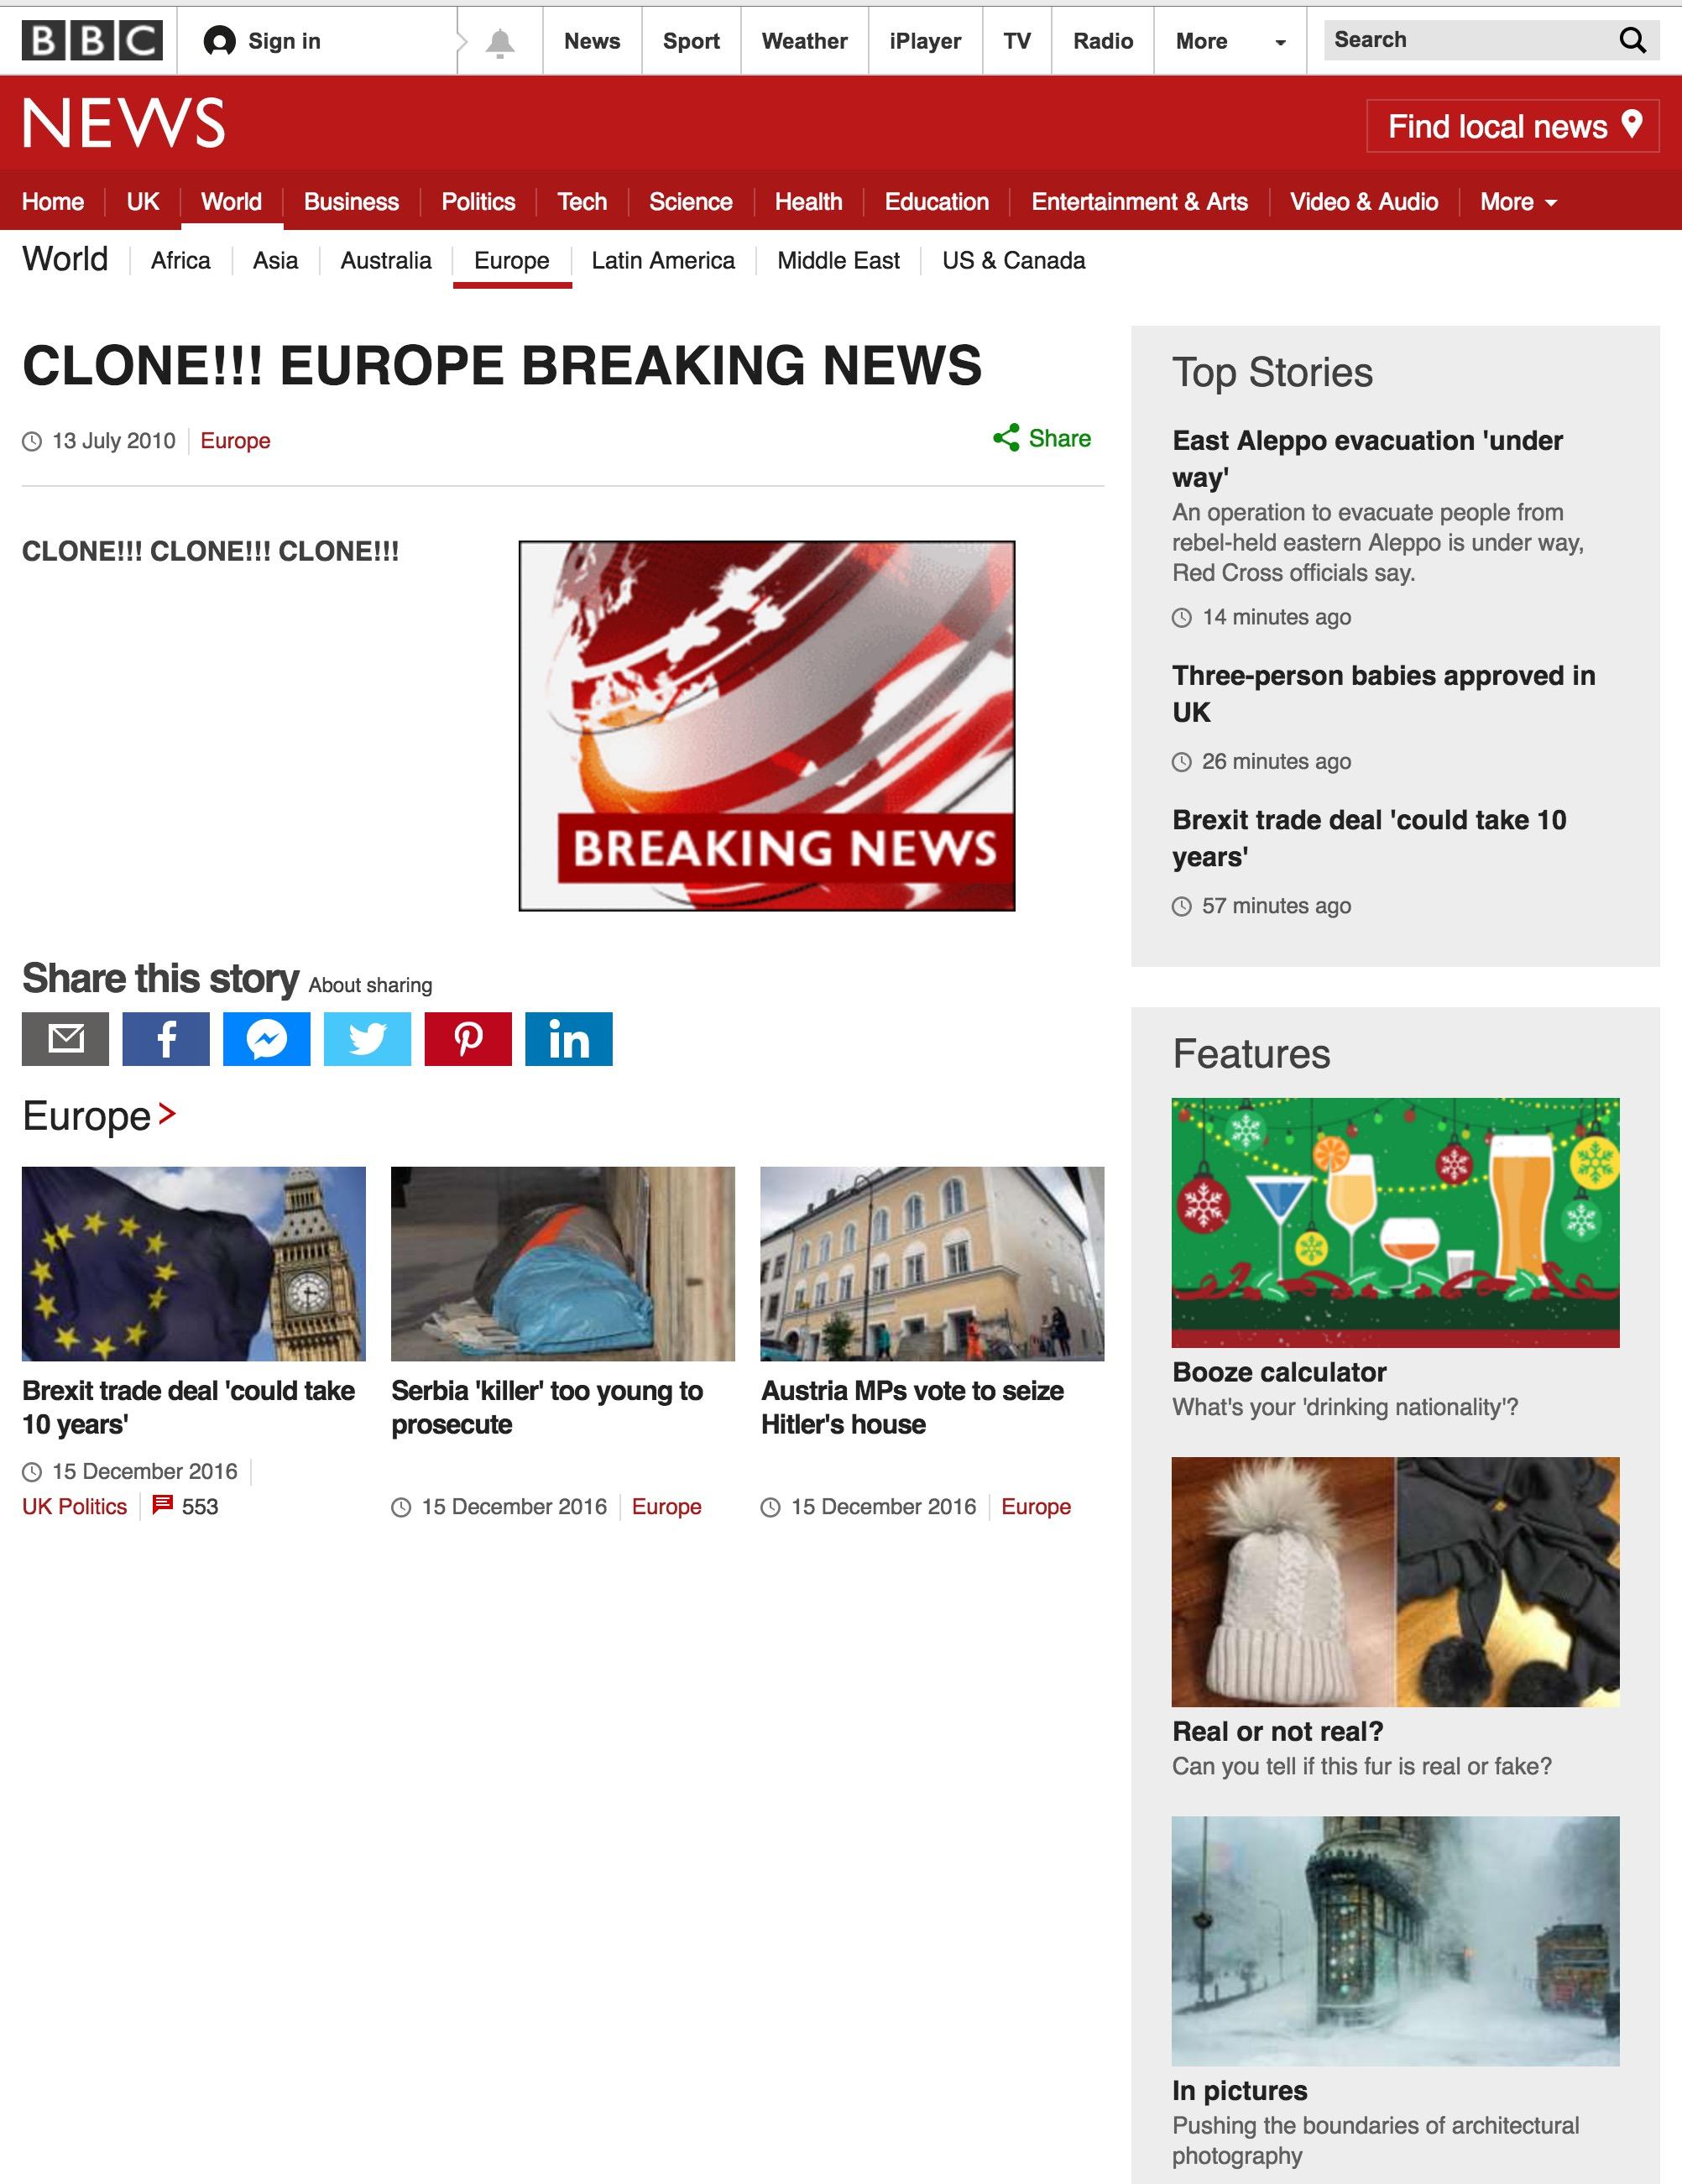 bbc-website